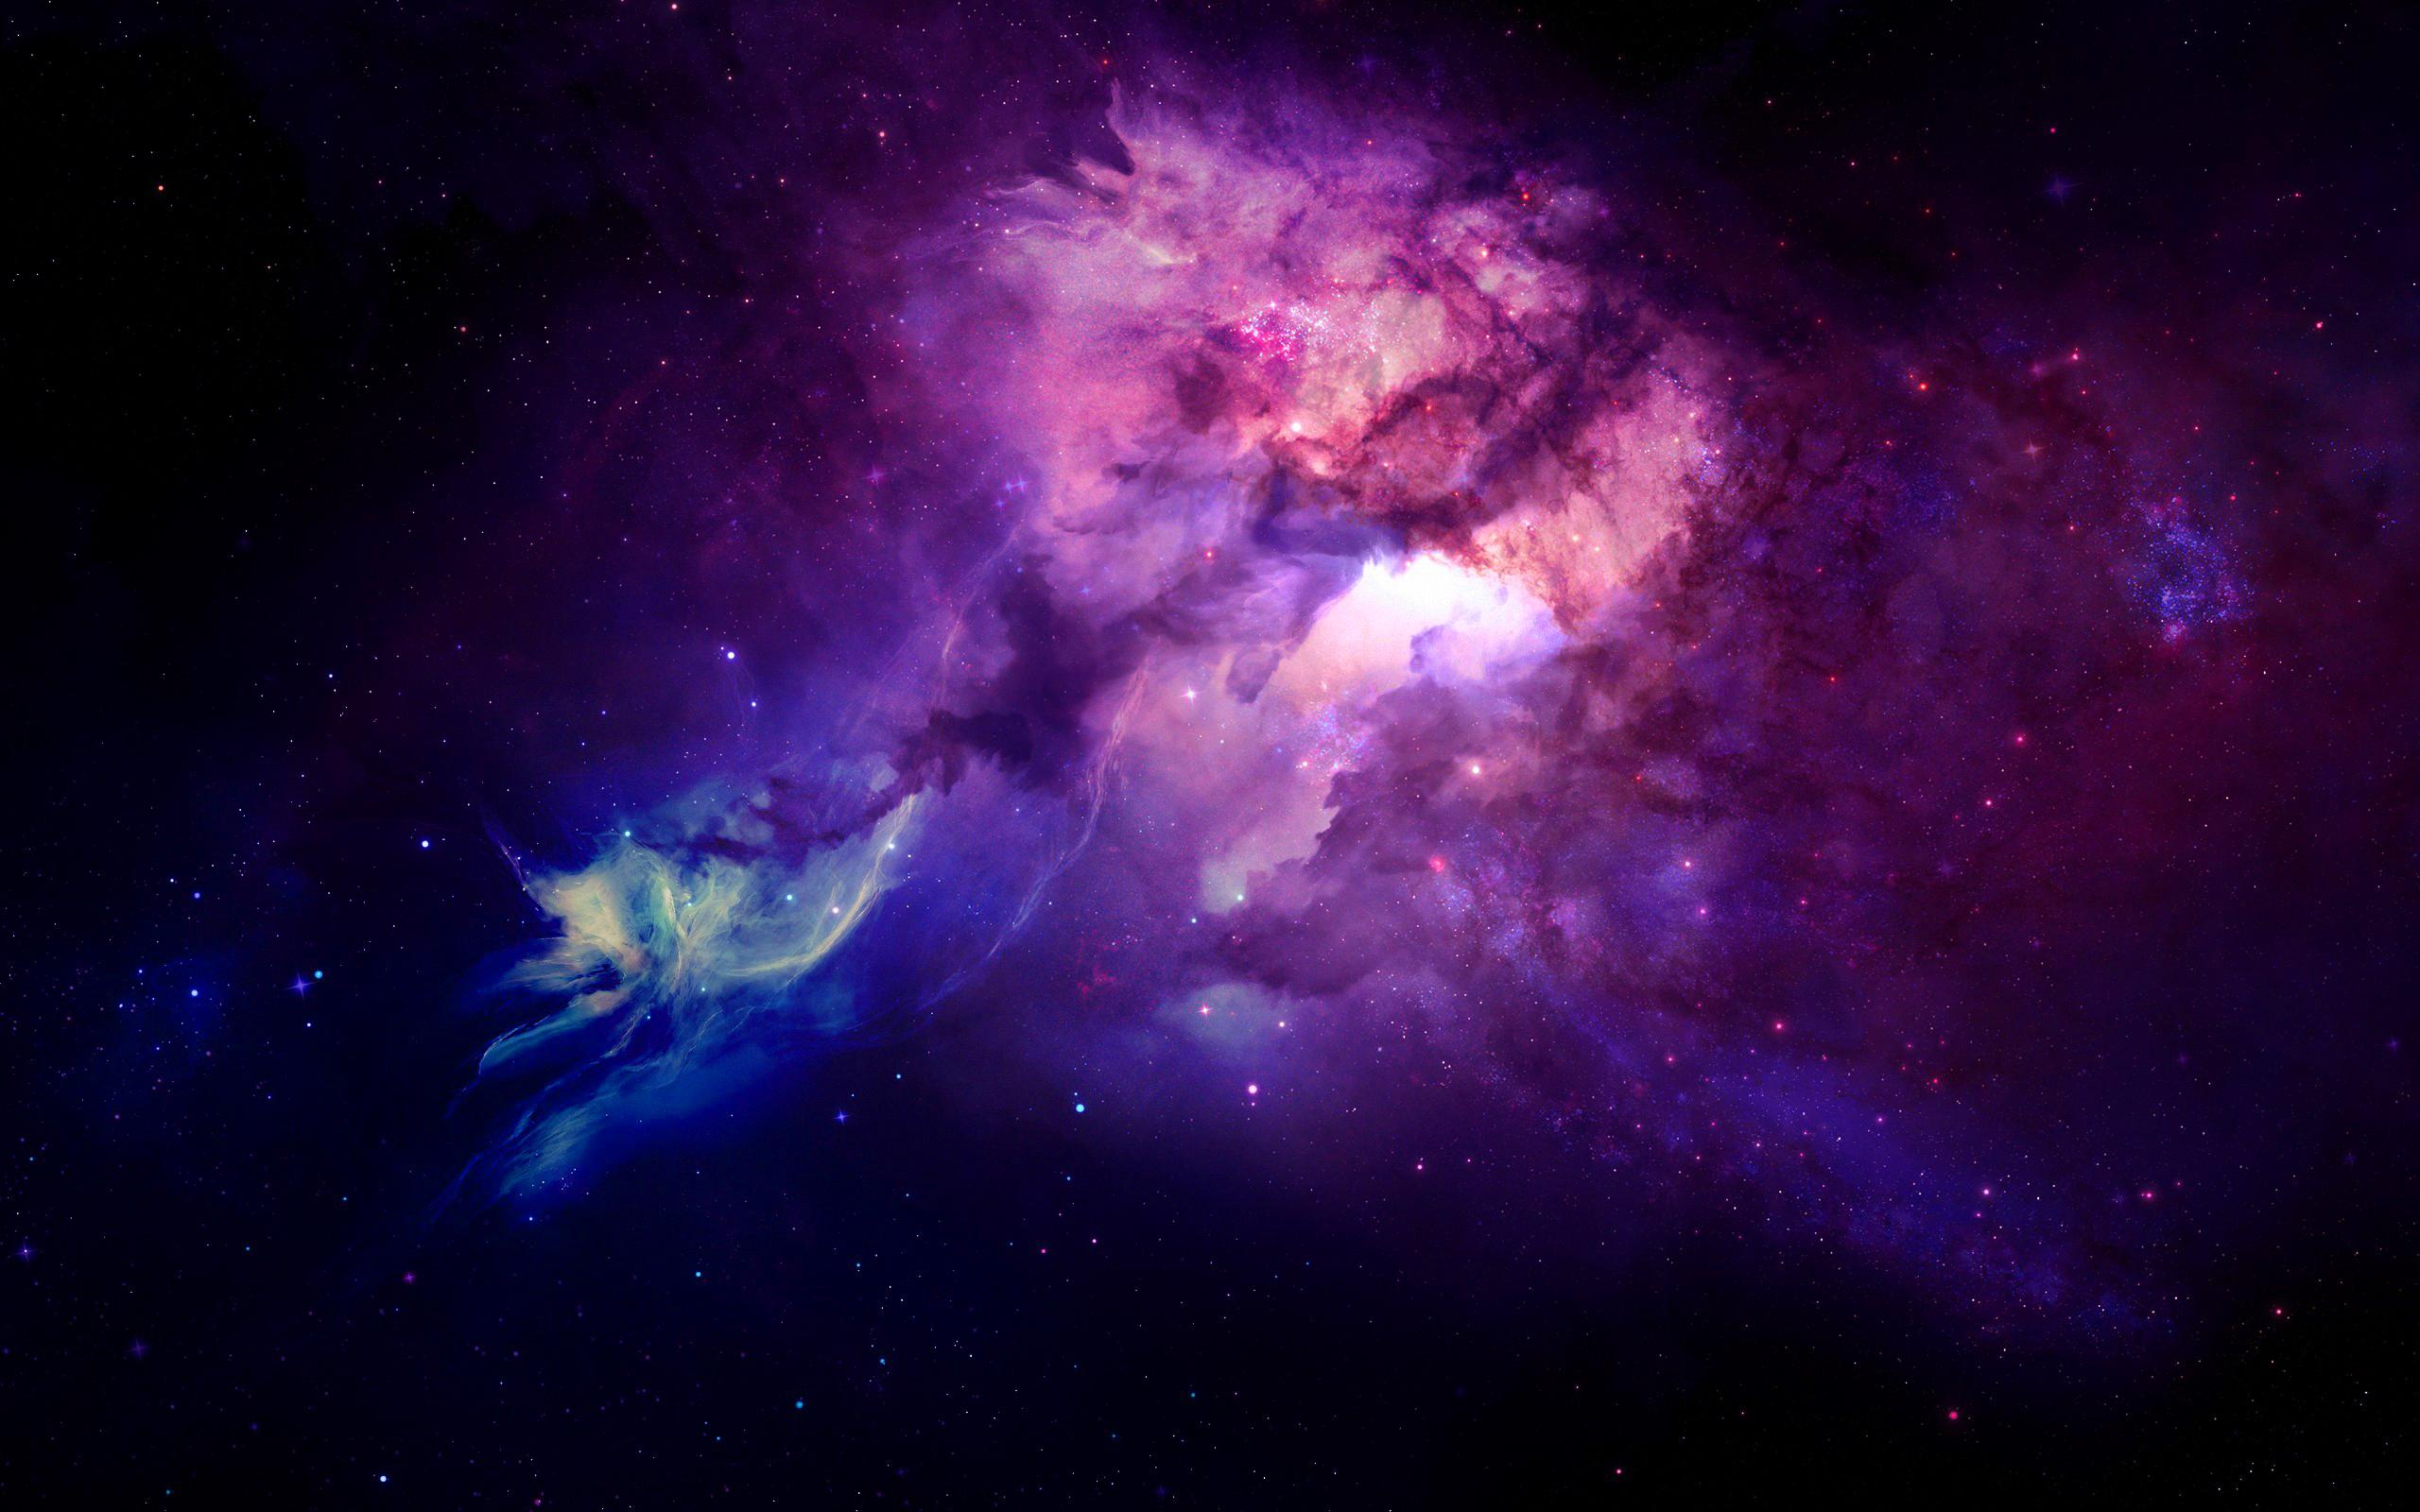 Nebula Backgrounds, Compatible - PC, Mobile, Gadgets| 2560x1600 px